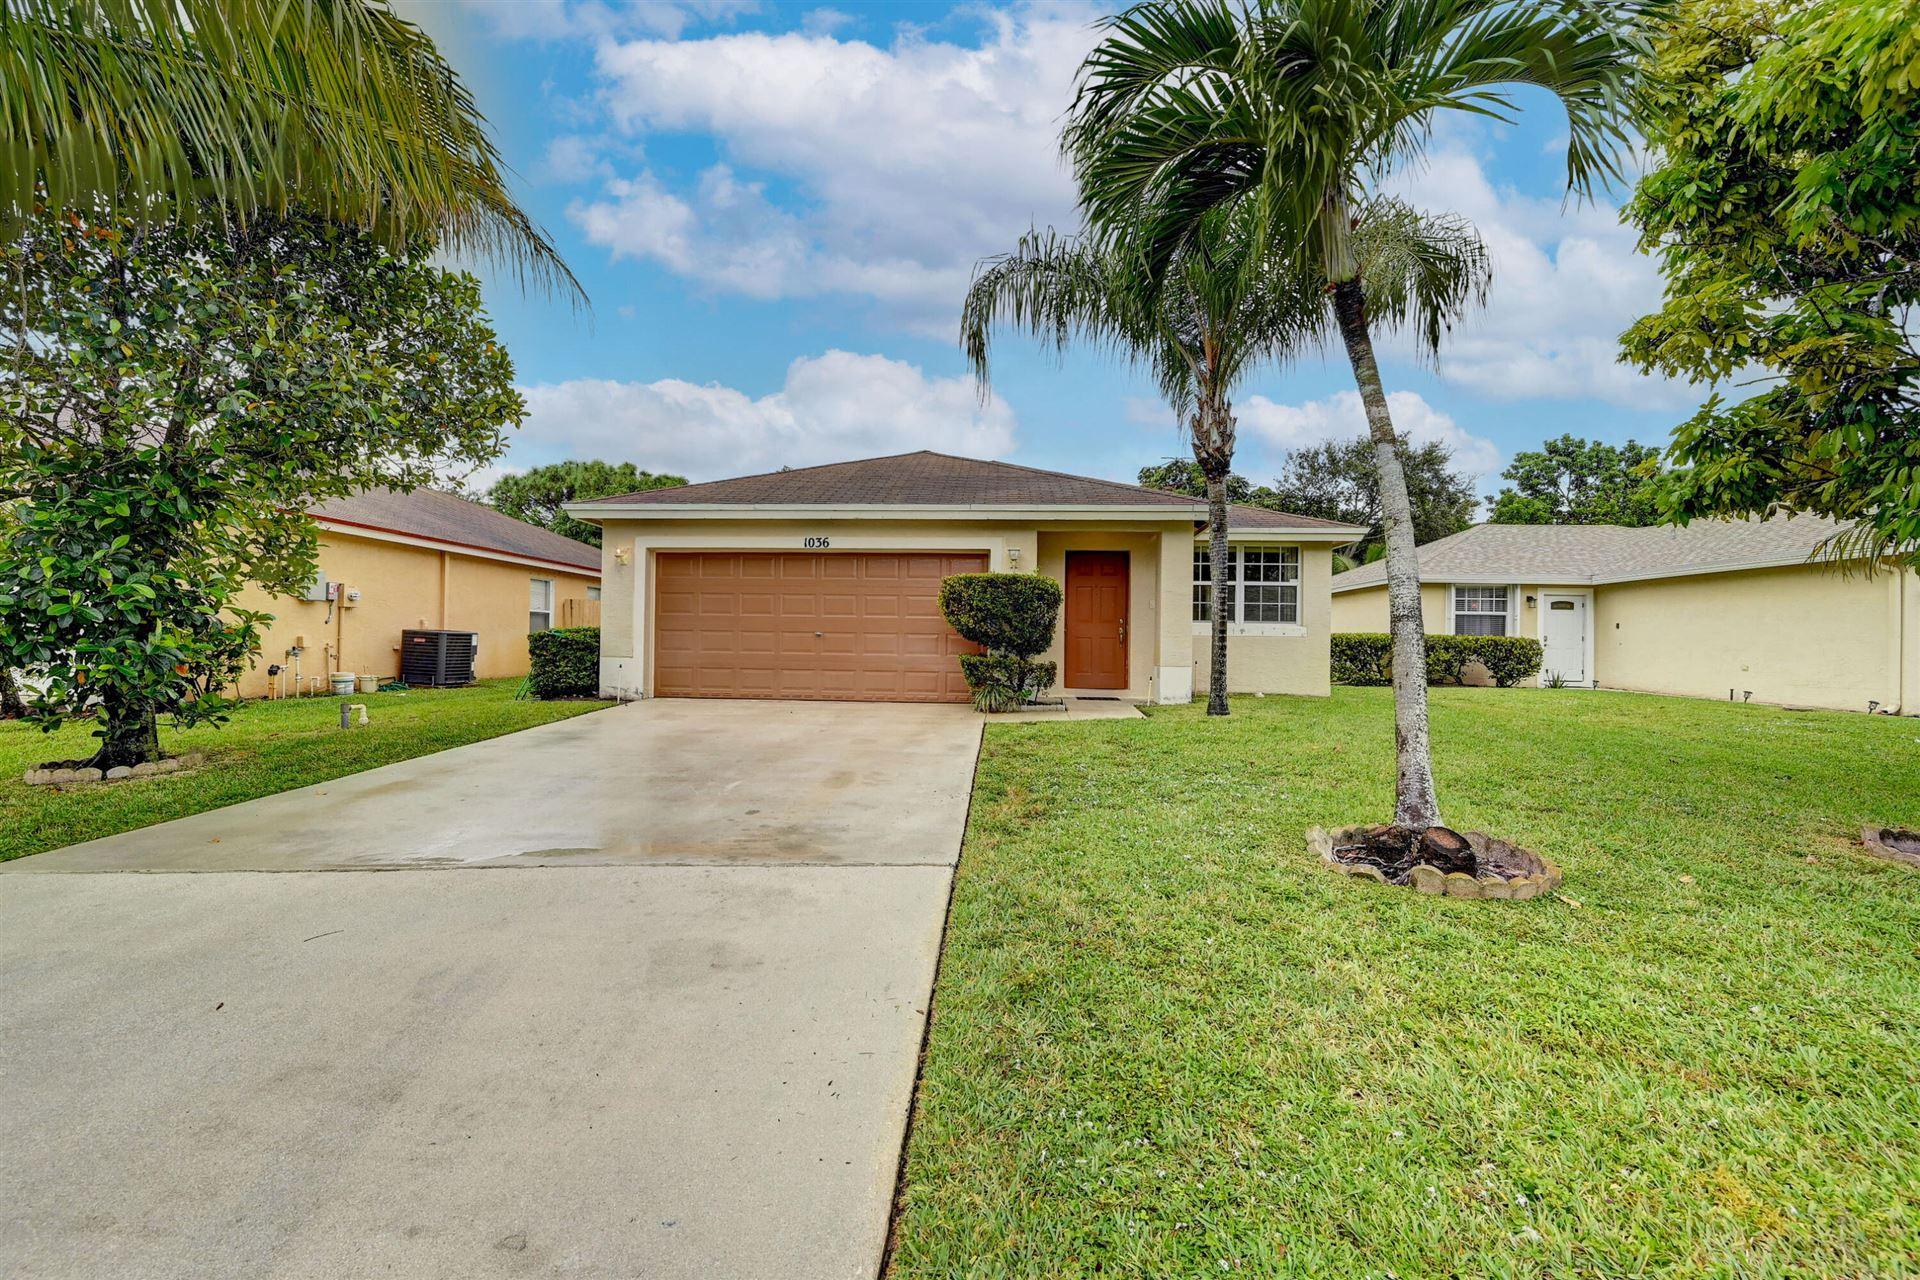 1036 Park Hill Drive, West Palm Beach, FL 33417 - MLS#: RX-10754538